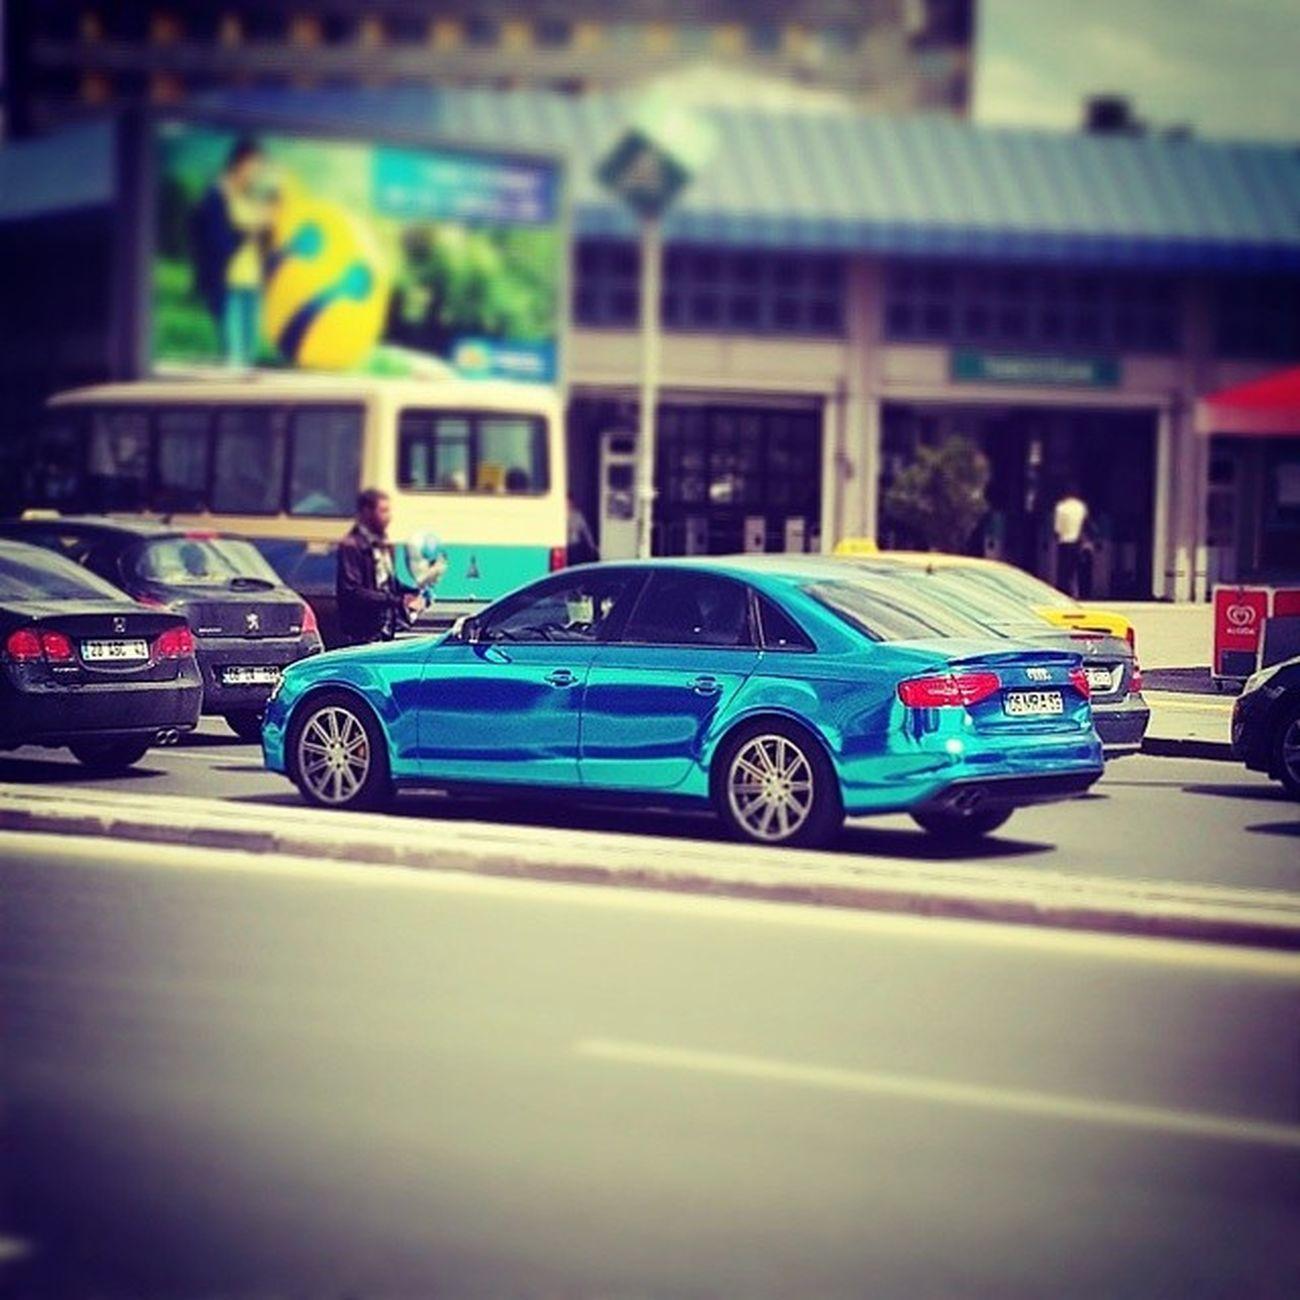 İşte bunu yapan kör olmuştur kilim filan hikaye... Tandogan Audi A8 Instacar greatcar modifycar audia8l beautifulcar coolcar howmany aftercollege sunnyday